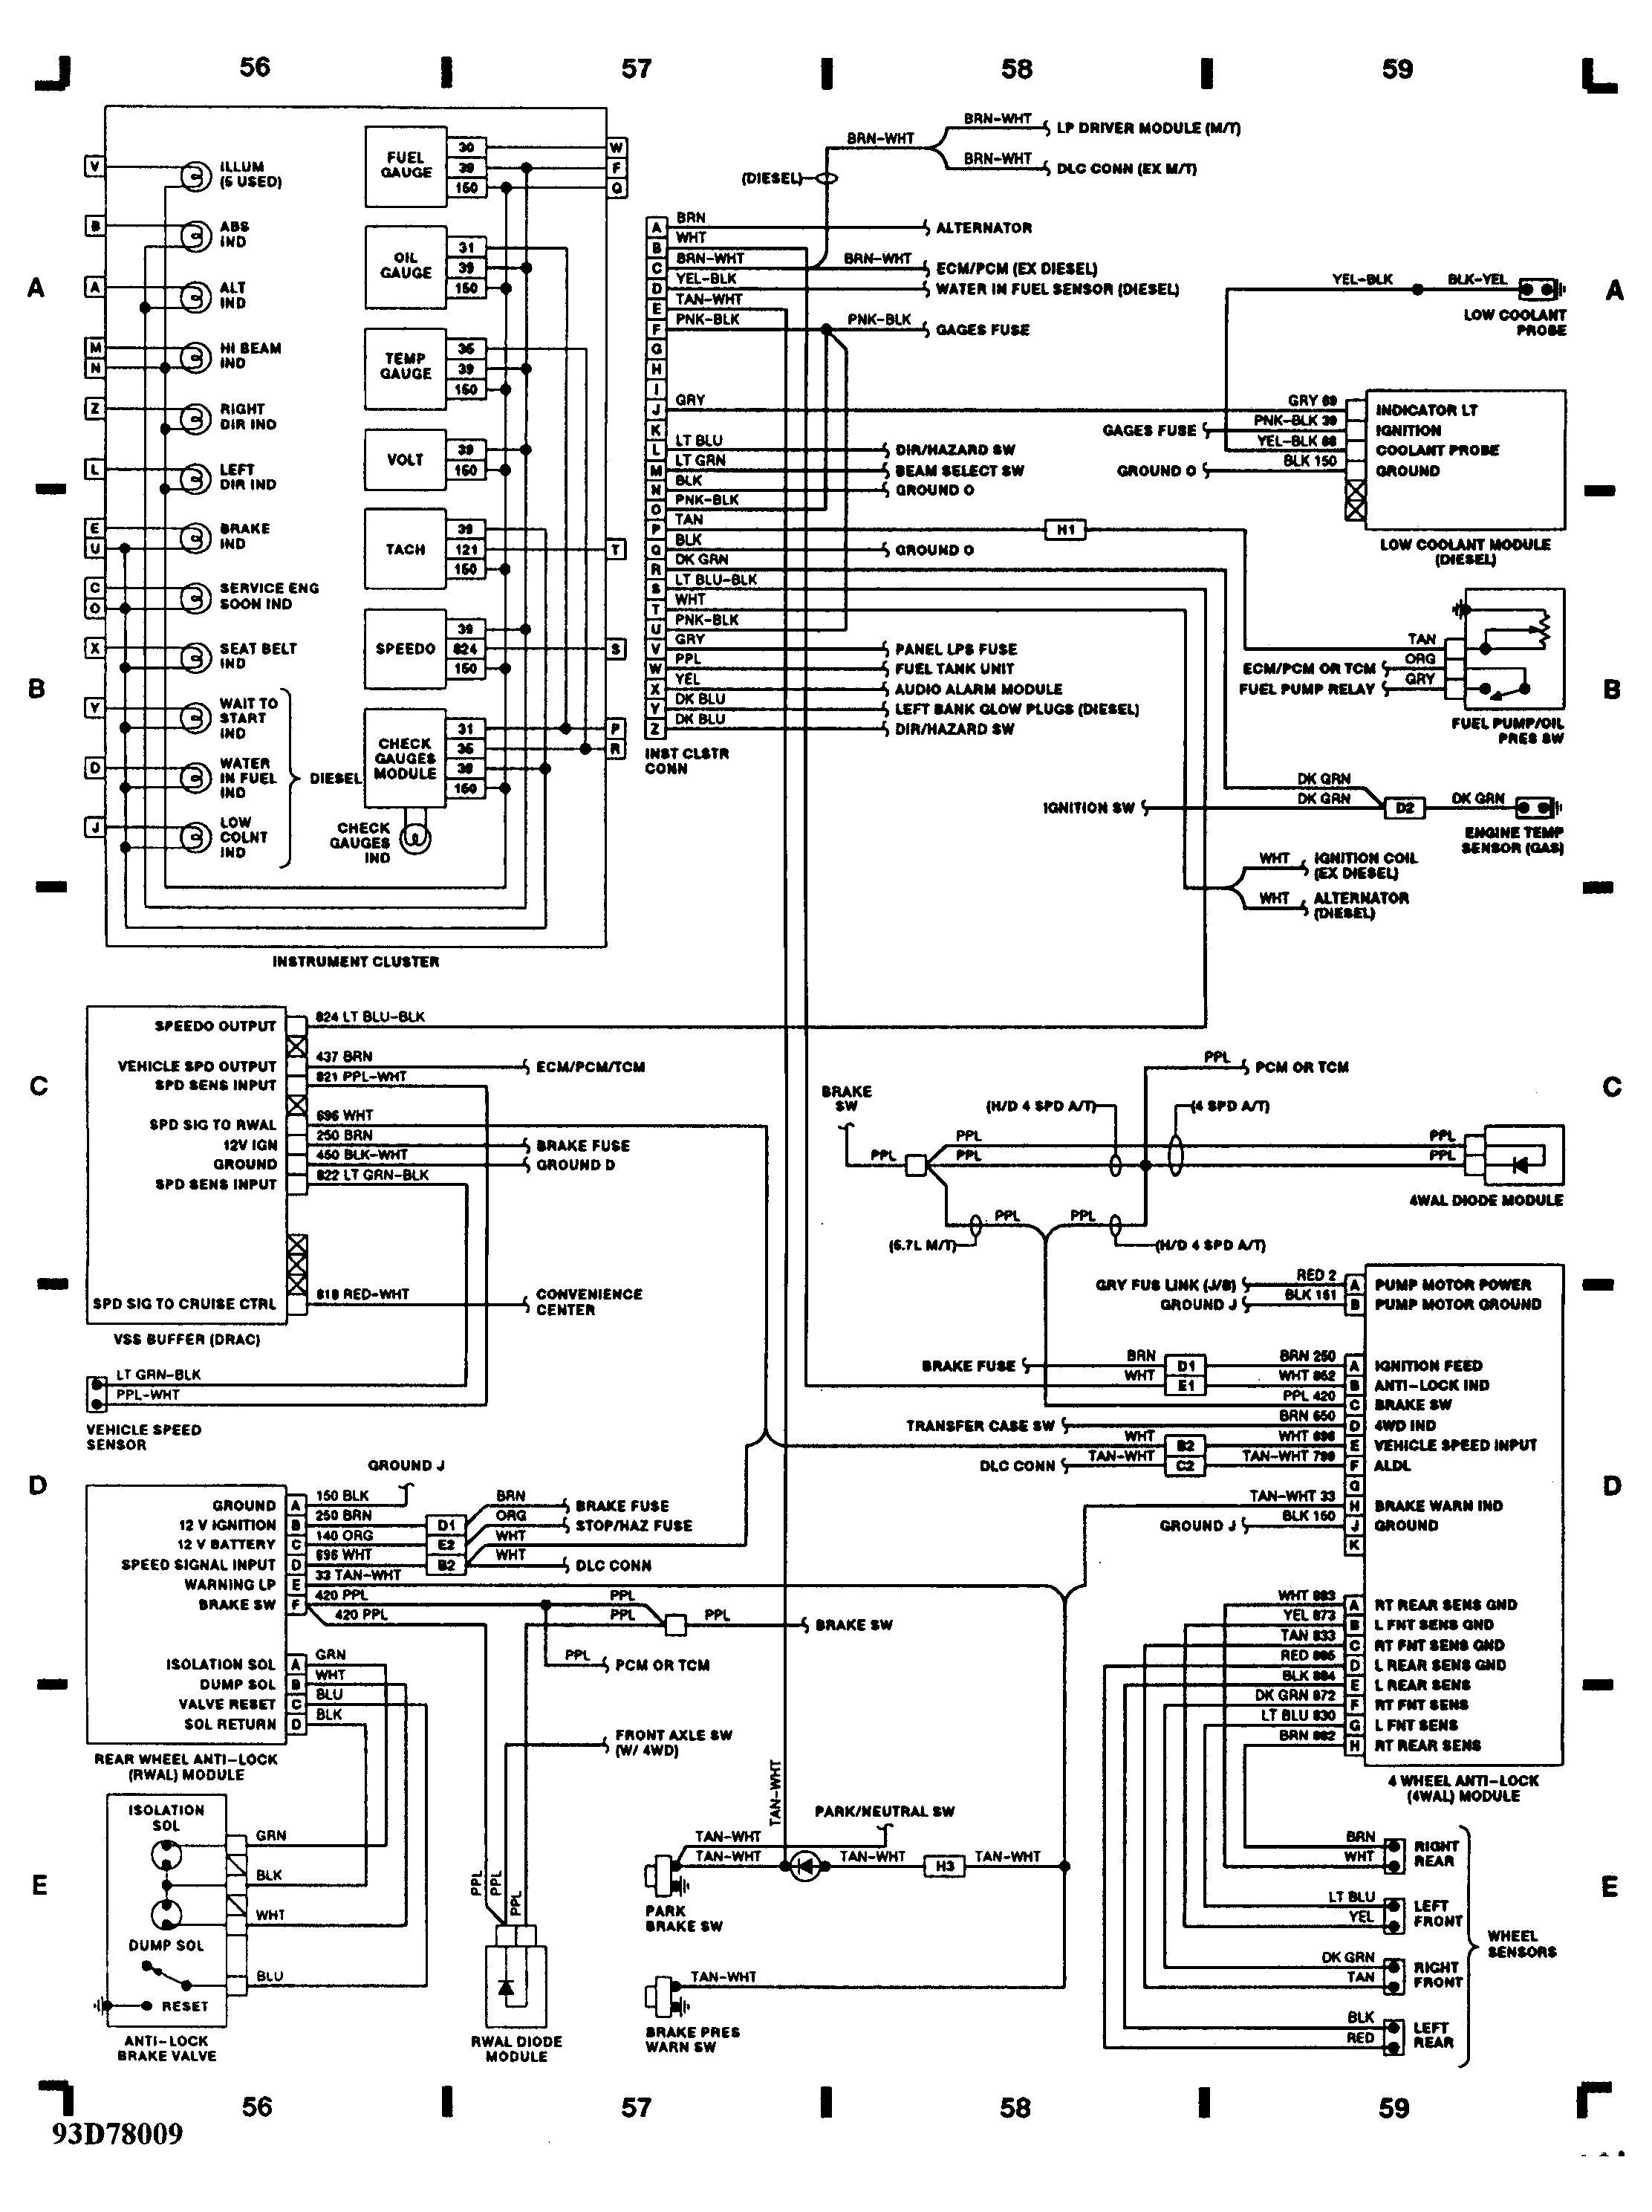 New Tbi Conversion Wiring Diagram Image Harness 5 3 Vortec Engine Schematic Diagrams U2022 Rh Detox Design Co Lt1